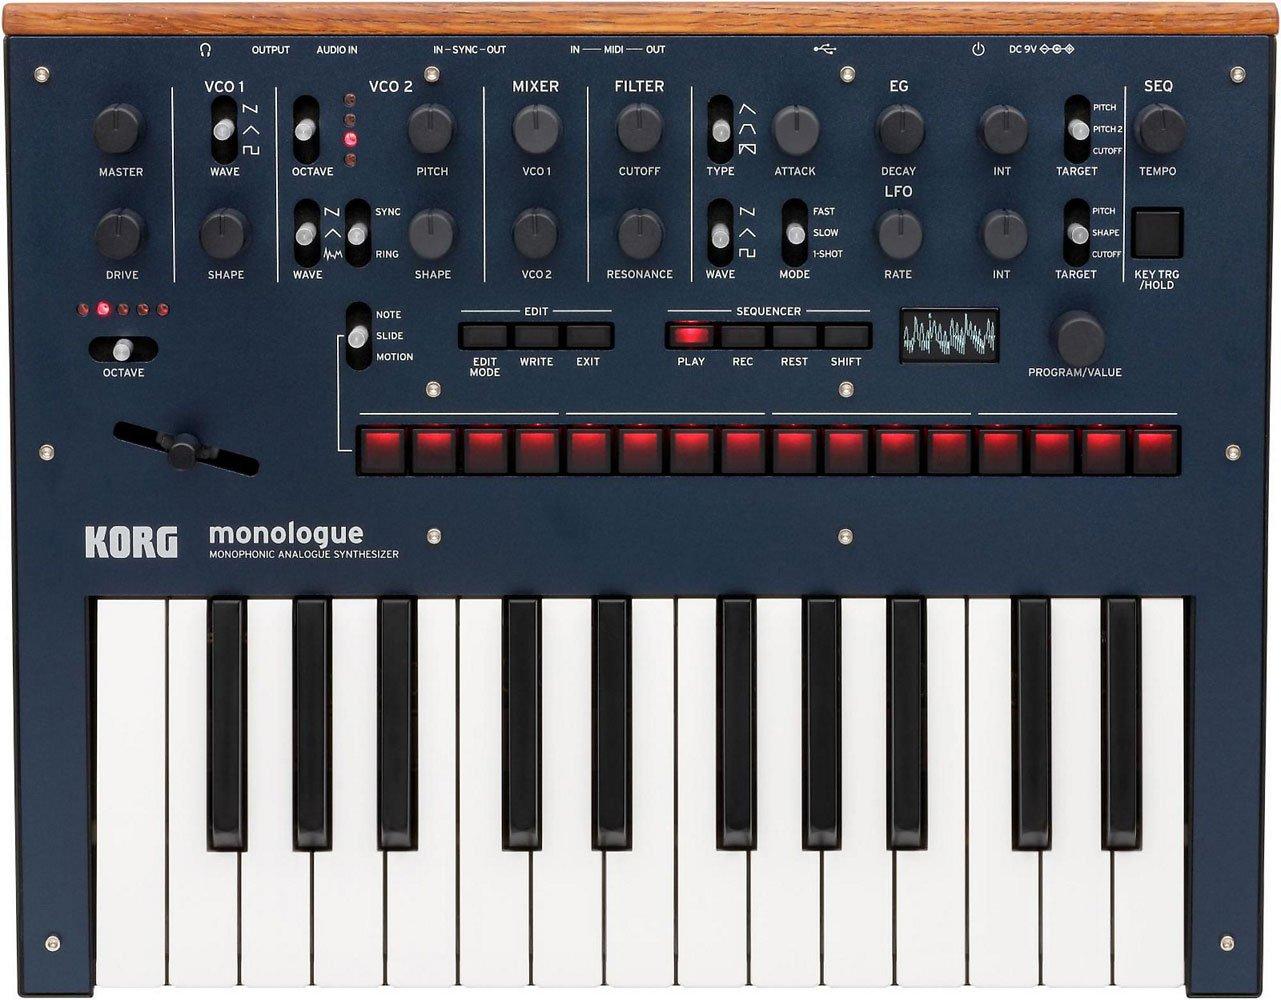 KORG Monologue 25-Key Compact Monophonic Analog Synthesizer - Blue by Korg